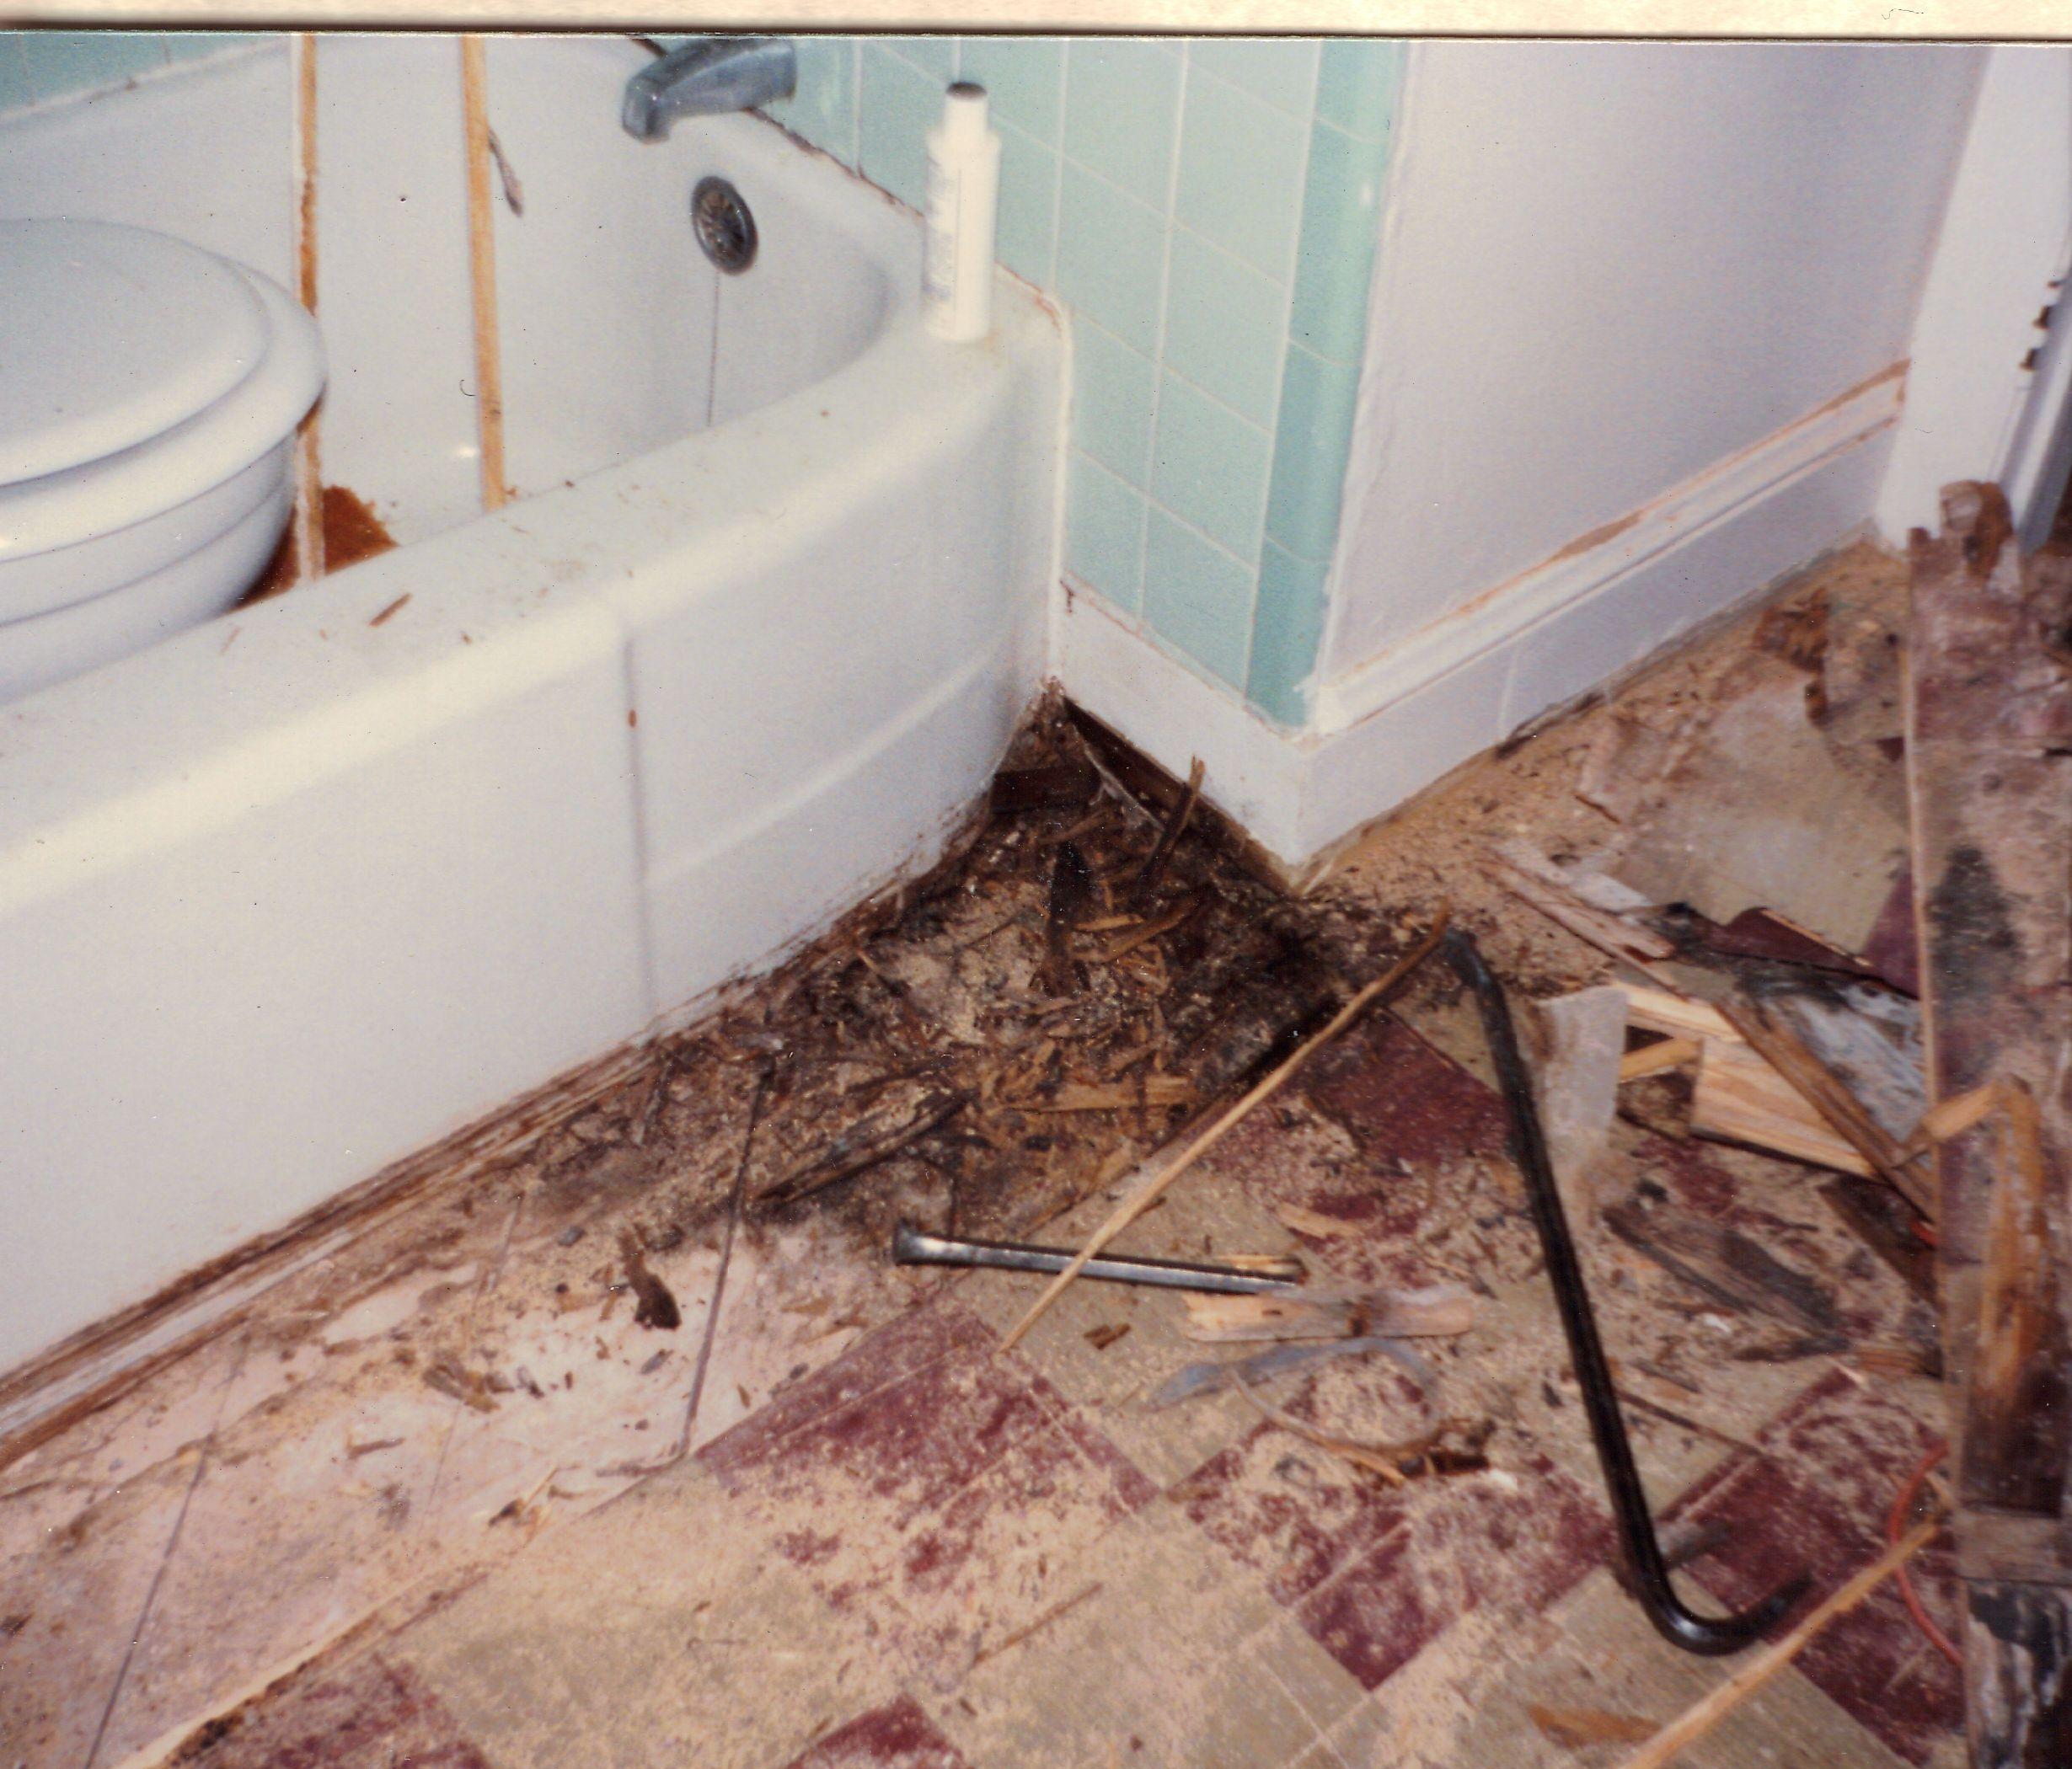 Rotten Bathroom Floor Google Search Bathroom Flooring Wood Bathroom Flooring